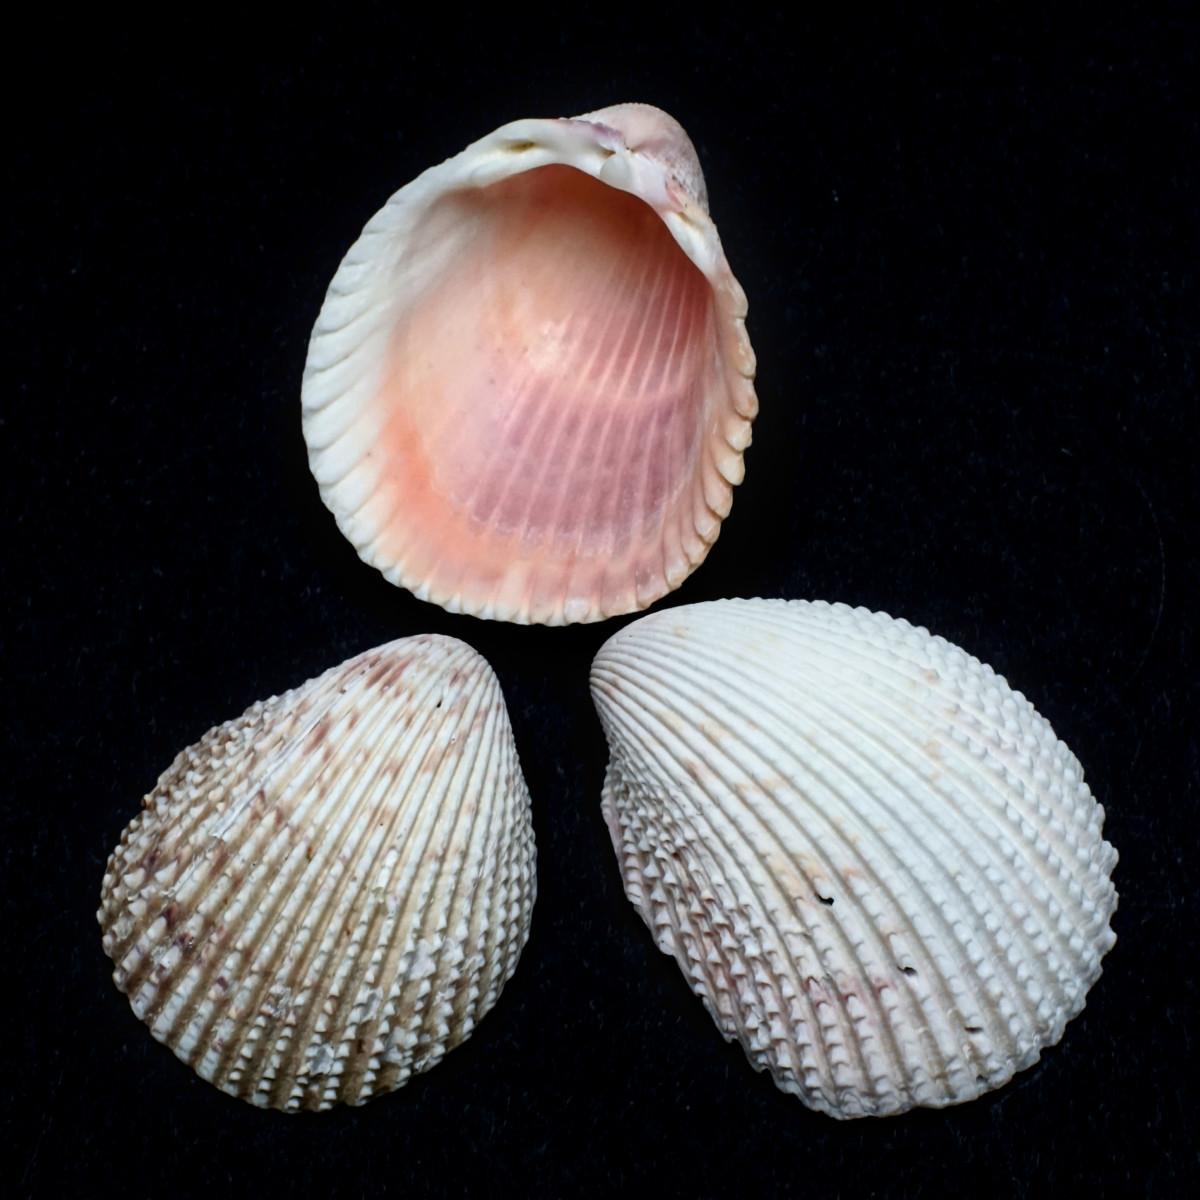 Florida Prickly Cockle Shells - Trachyardium egmontianum